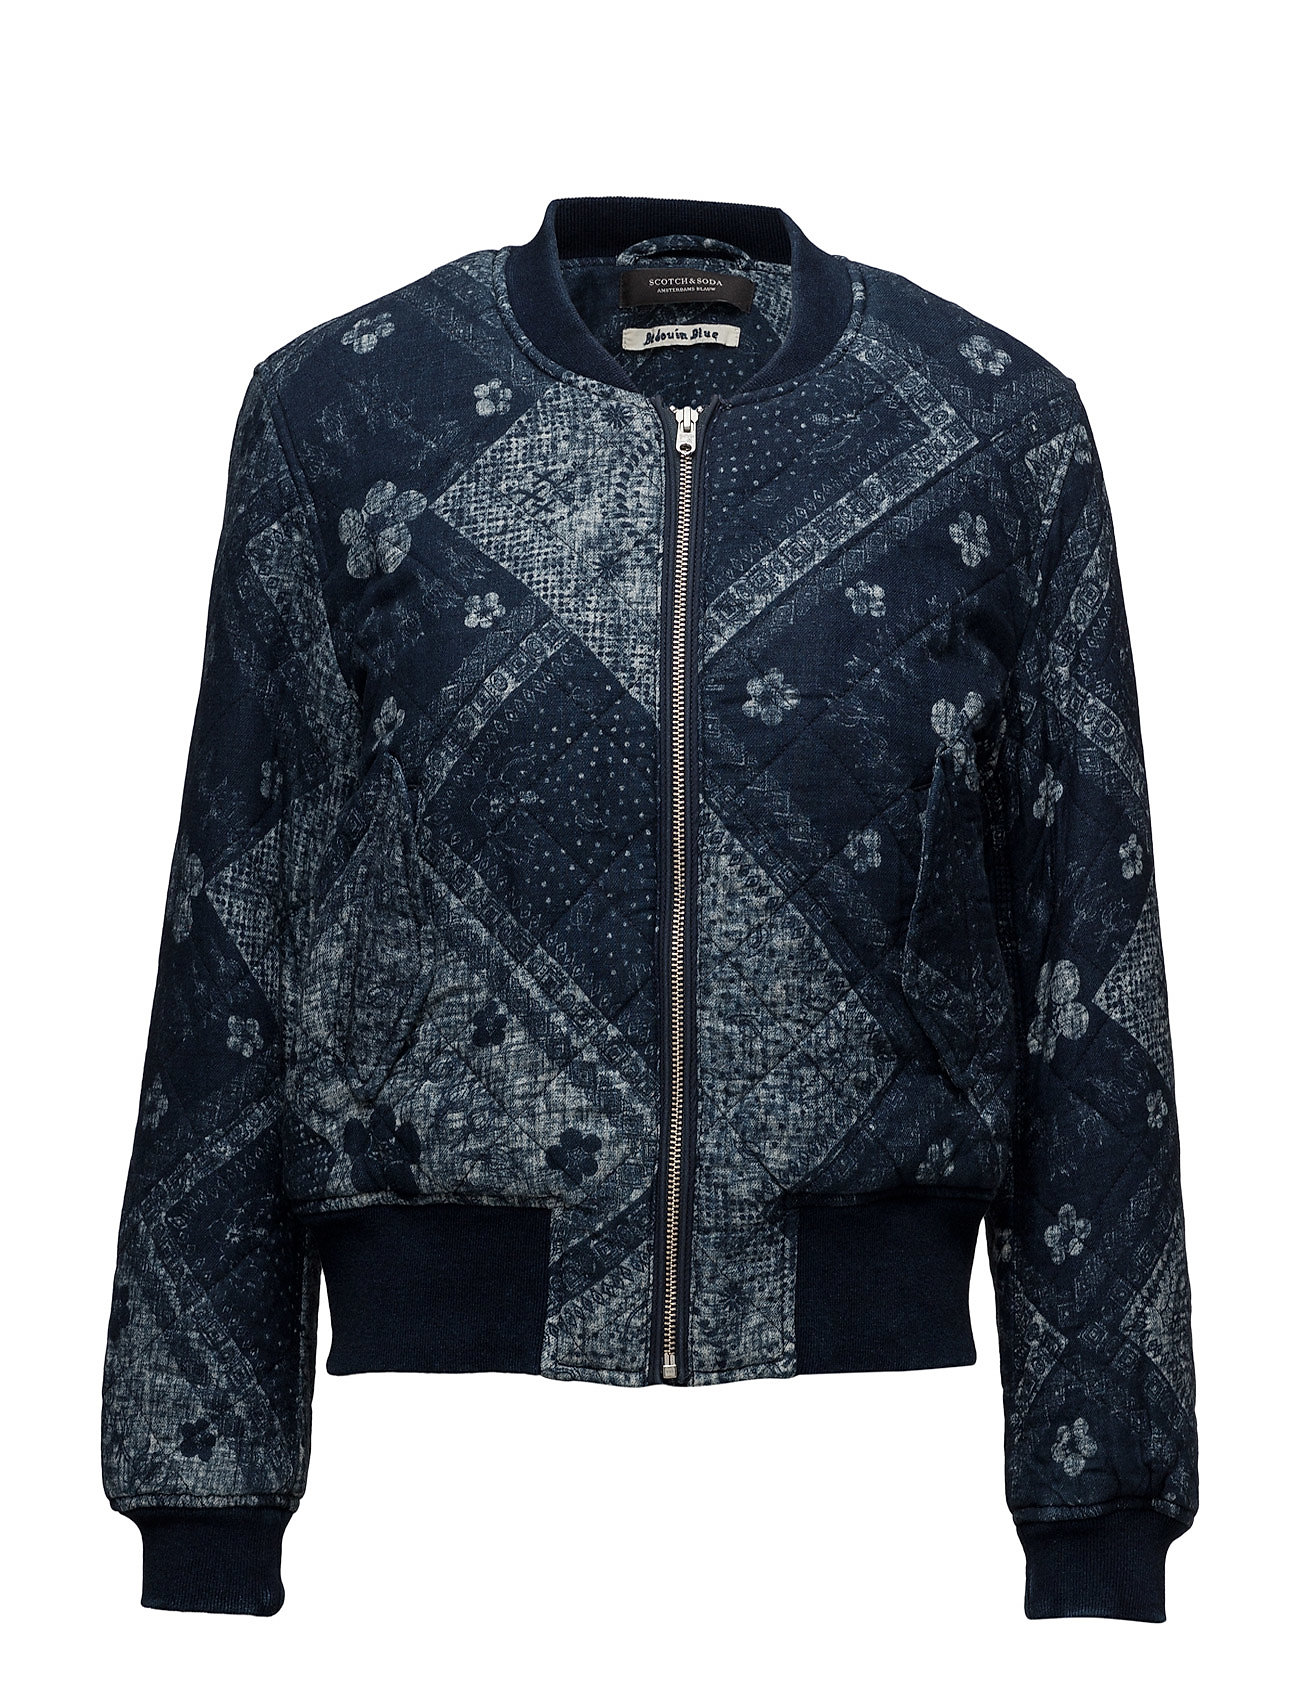 scotch & soda Bomber jacket in indigo quality på boozt.com dk